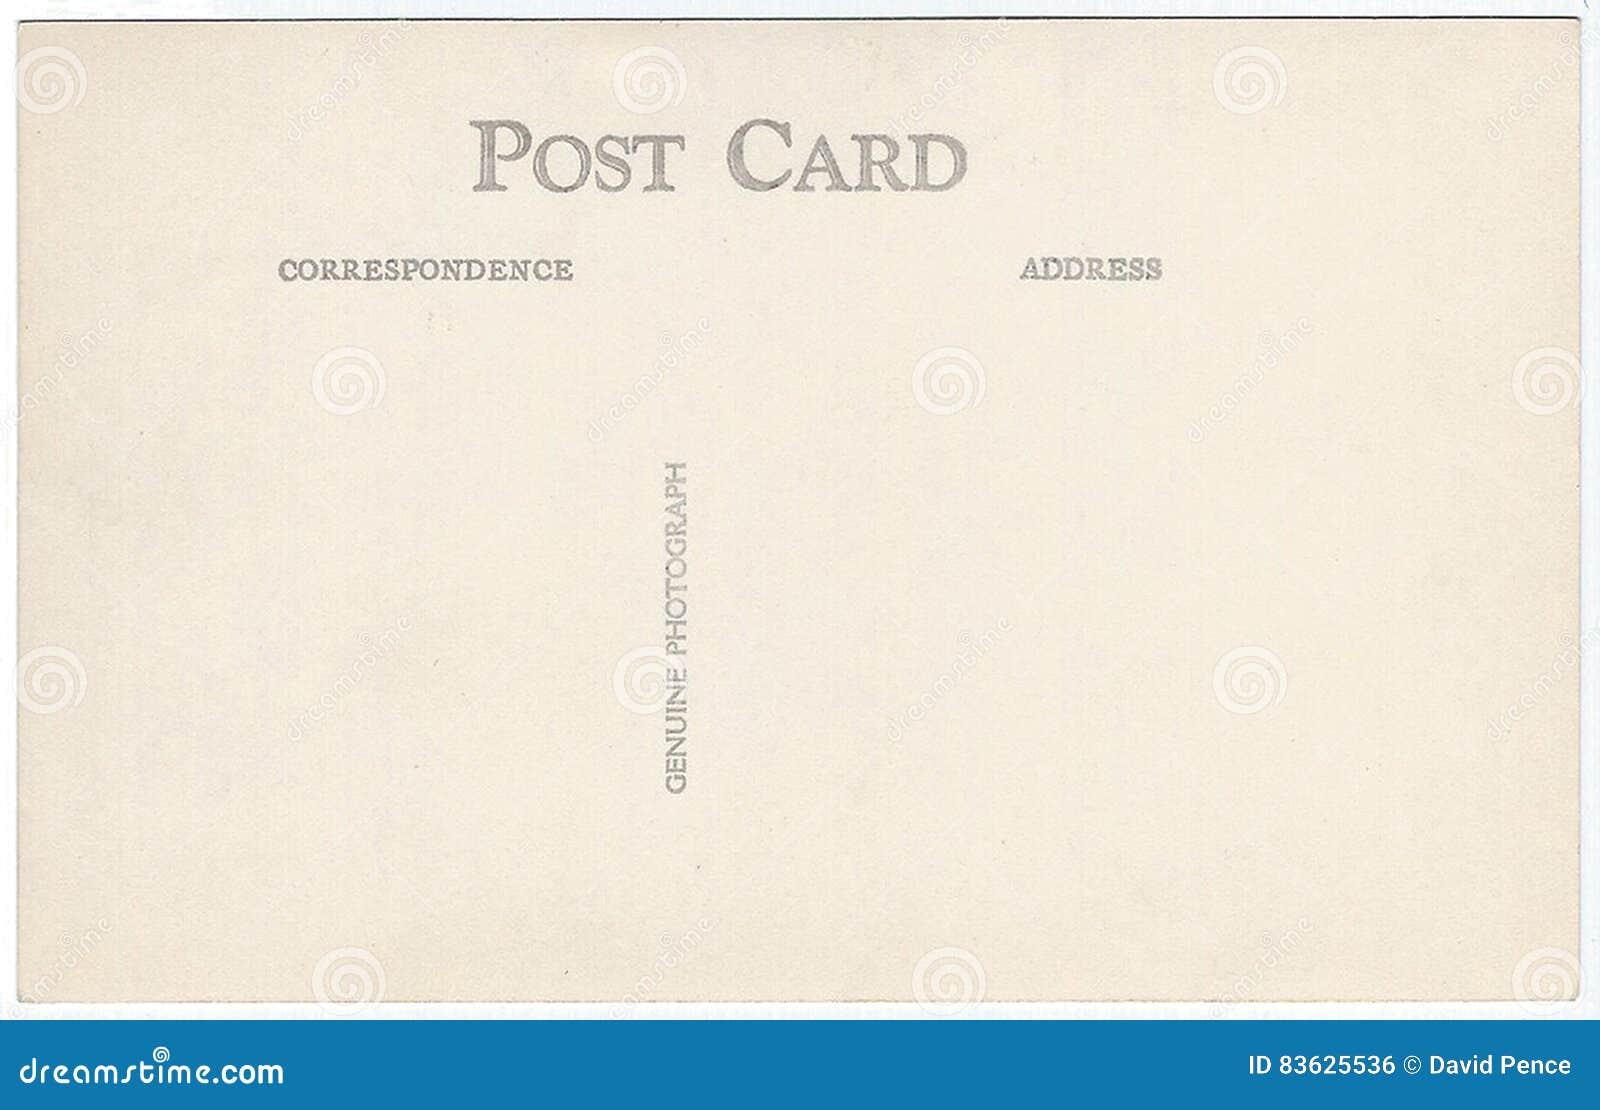 real photo postcard